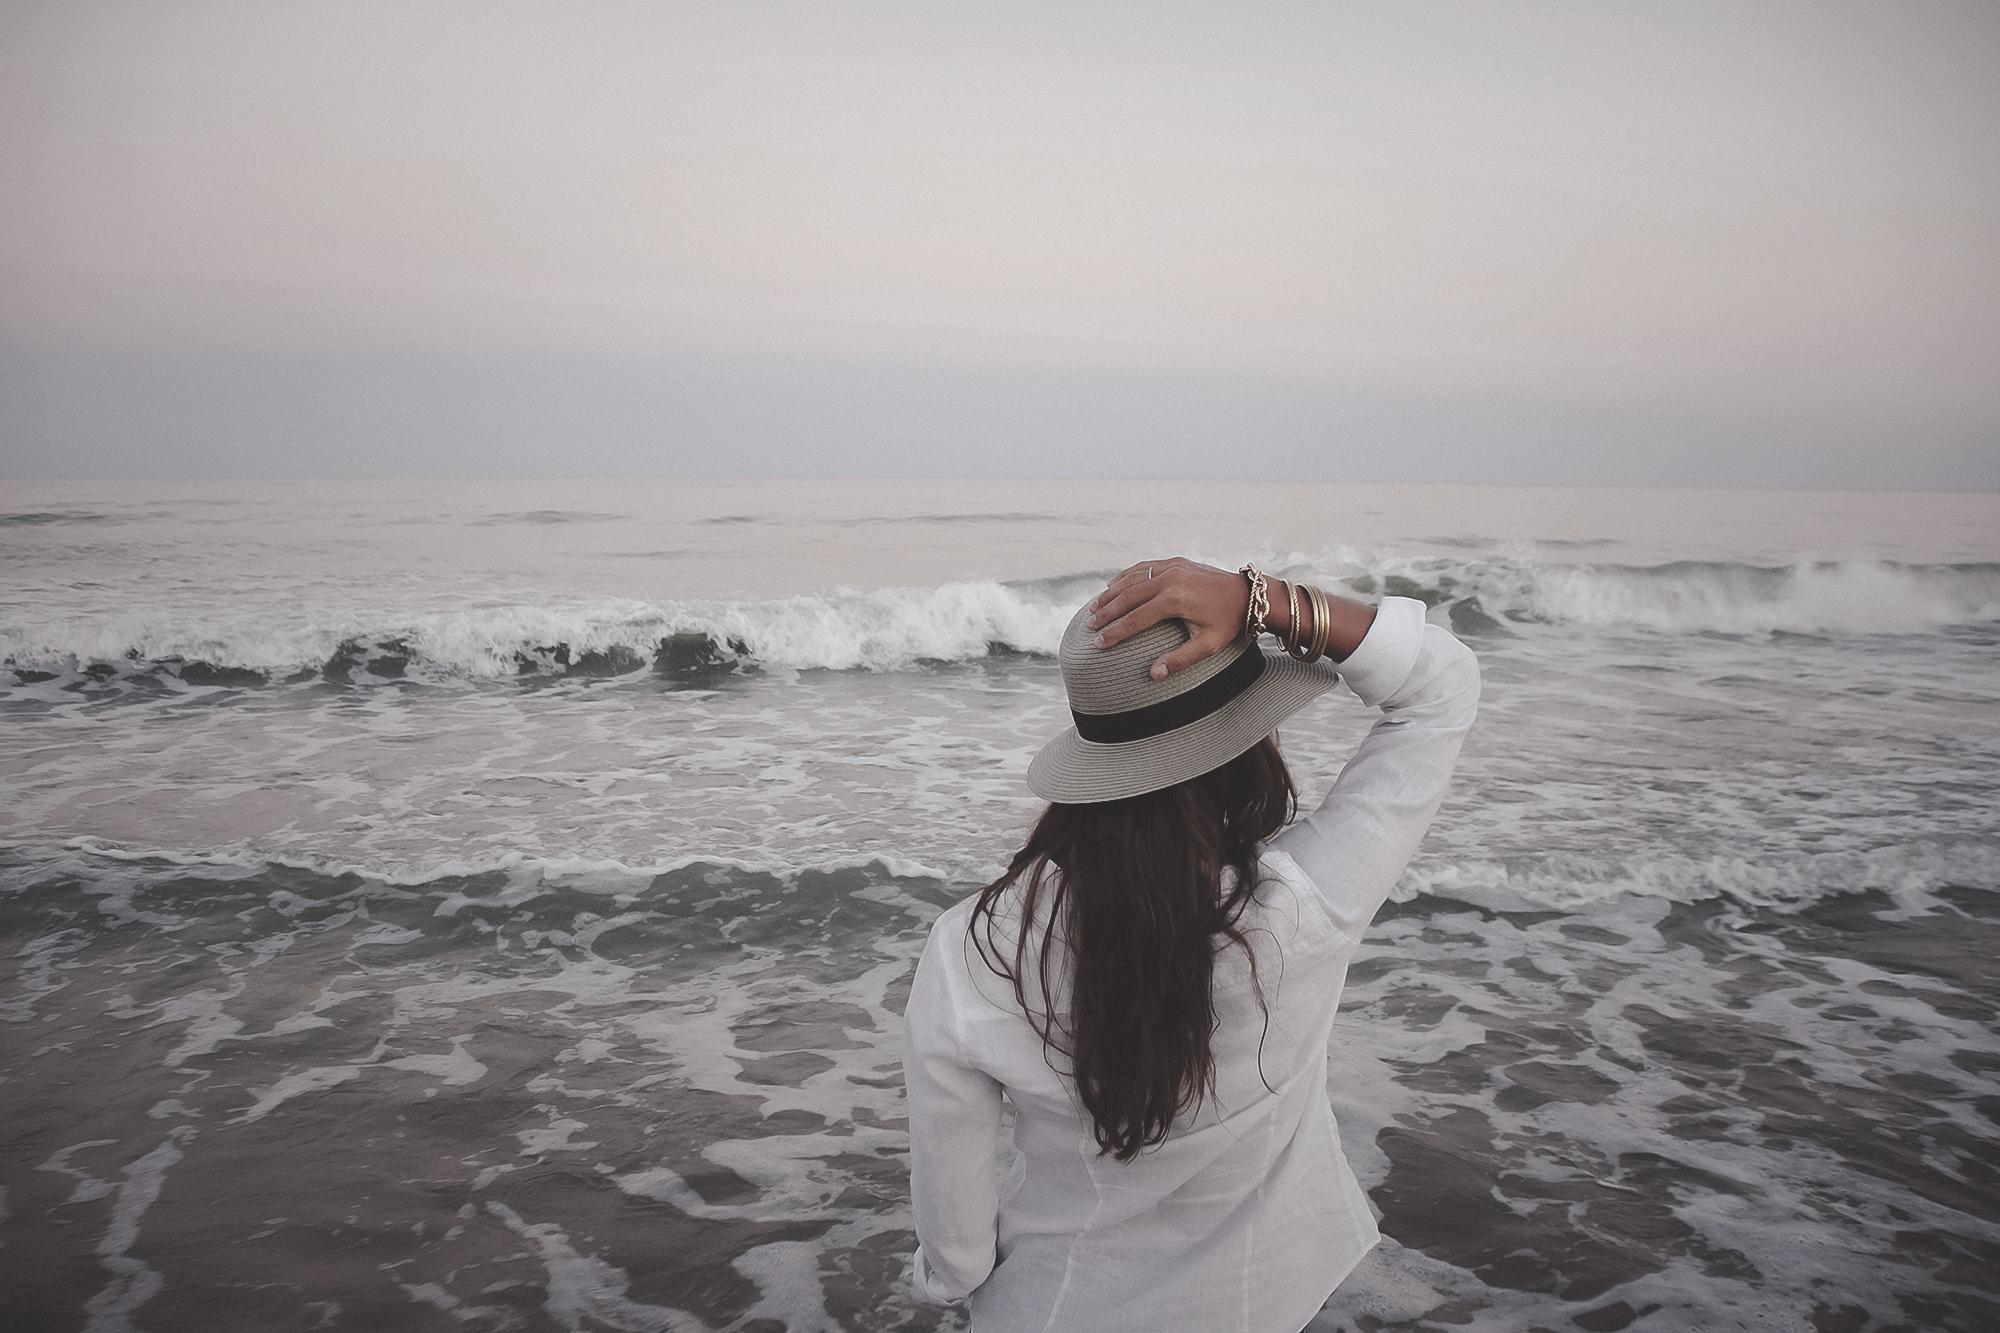 Mujer Mañana Oceano Blanco Fotos Playa Gratis Costa YzxqI74